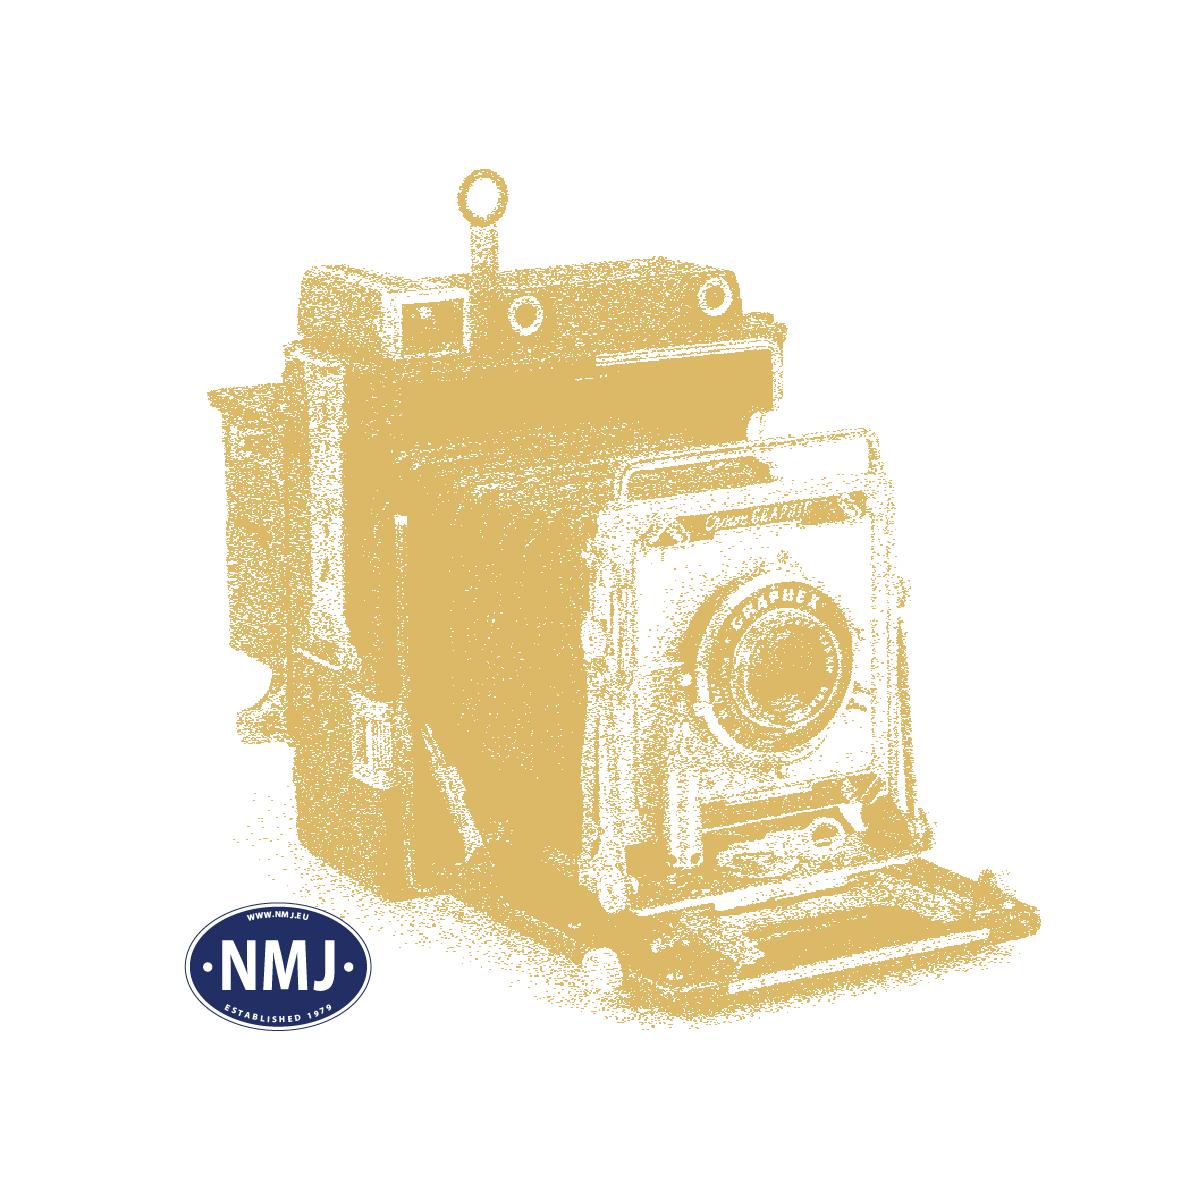 NMJT408.101 - NMJ Topline H-Start Baggage Coach Dms 85-91